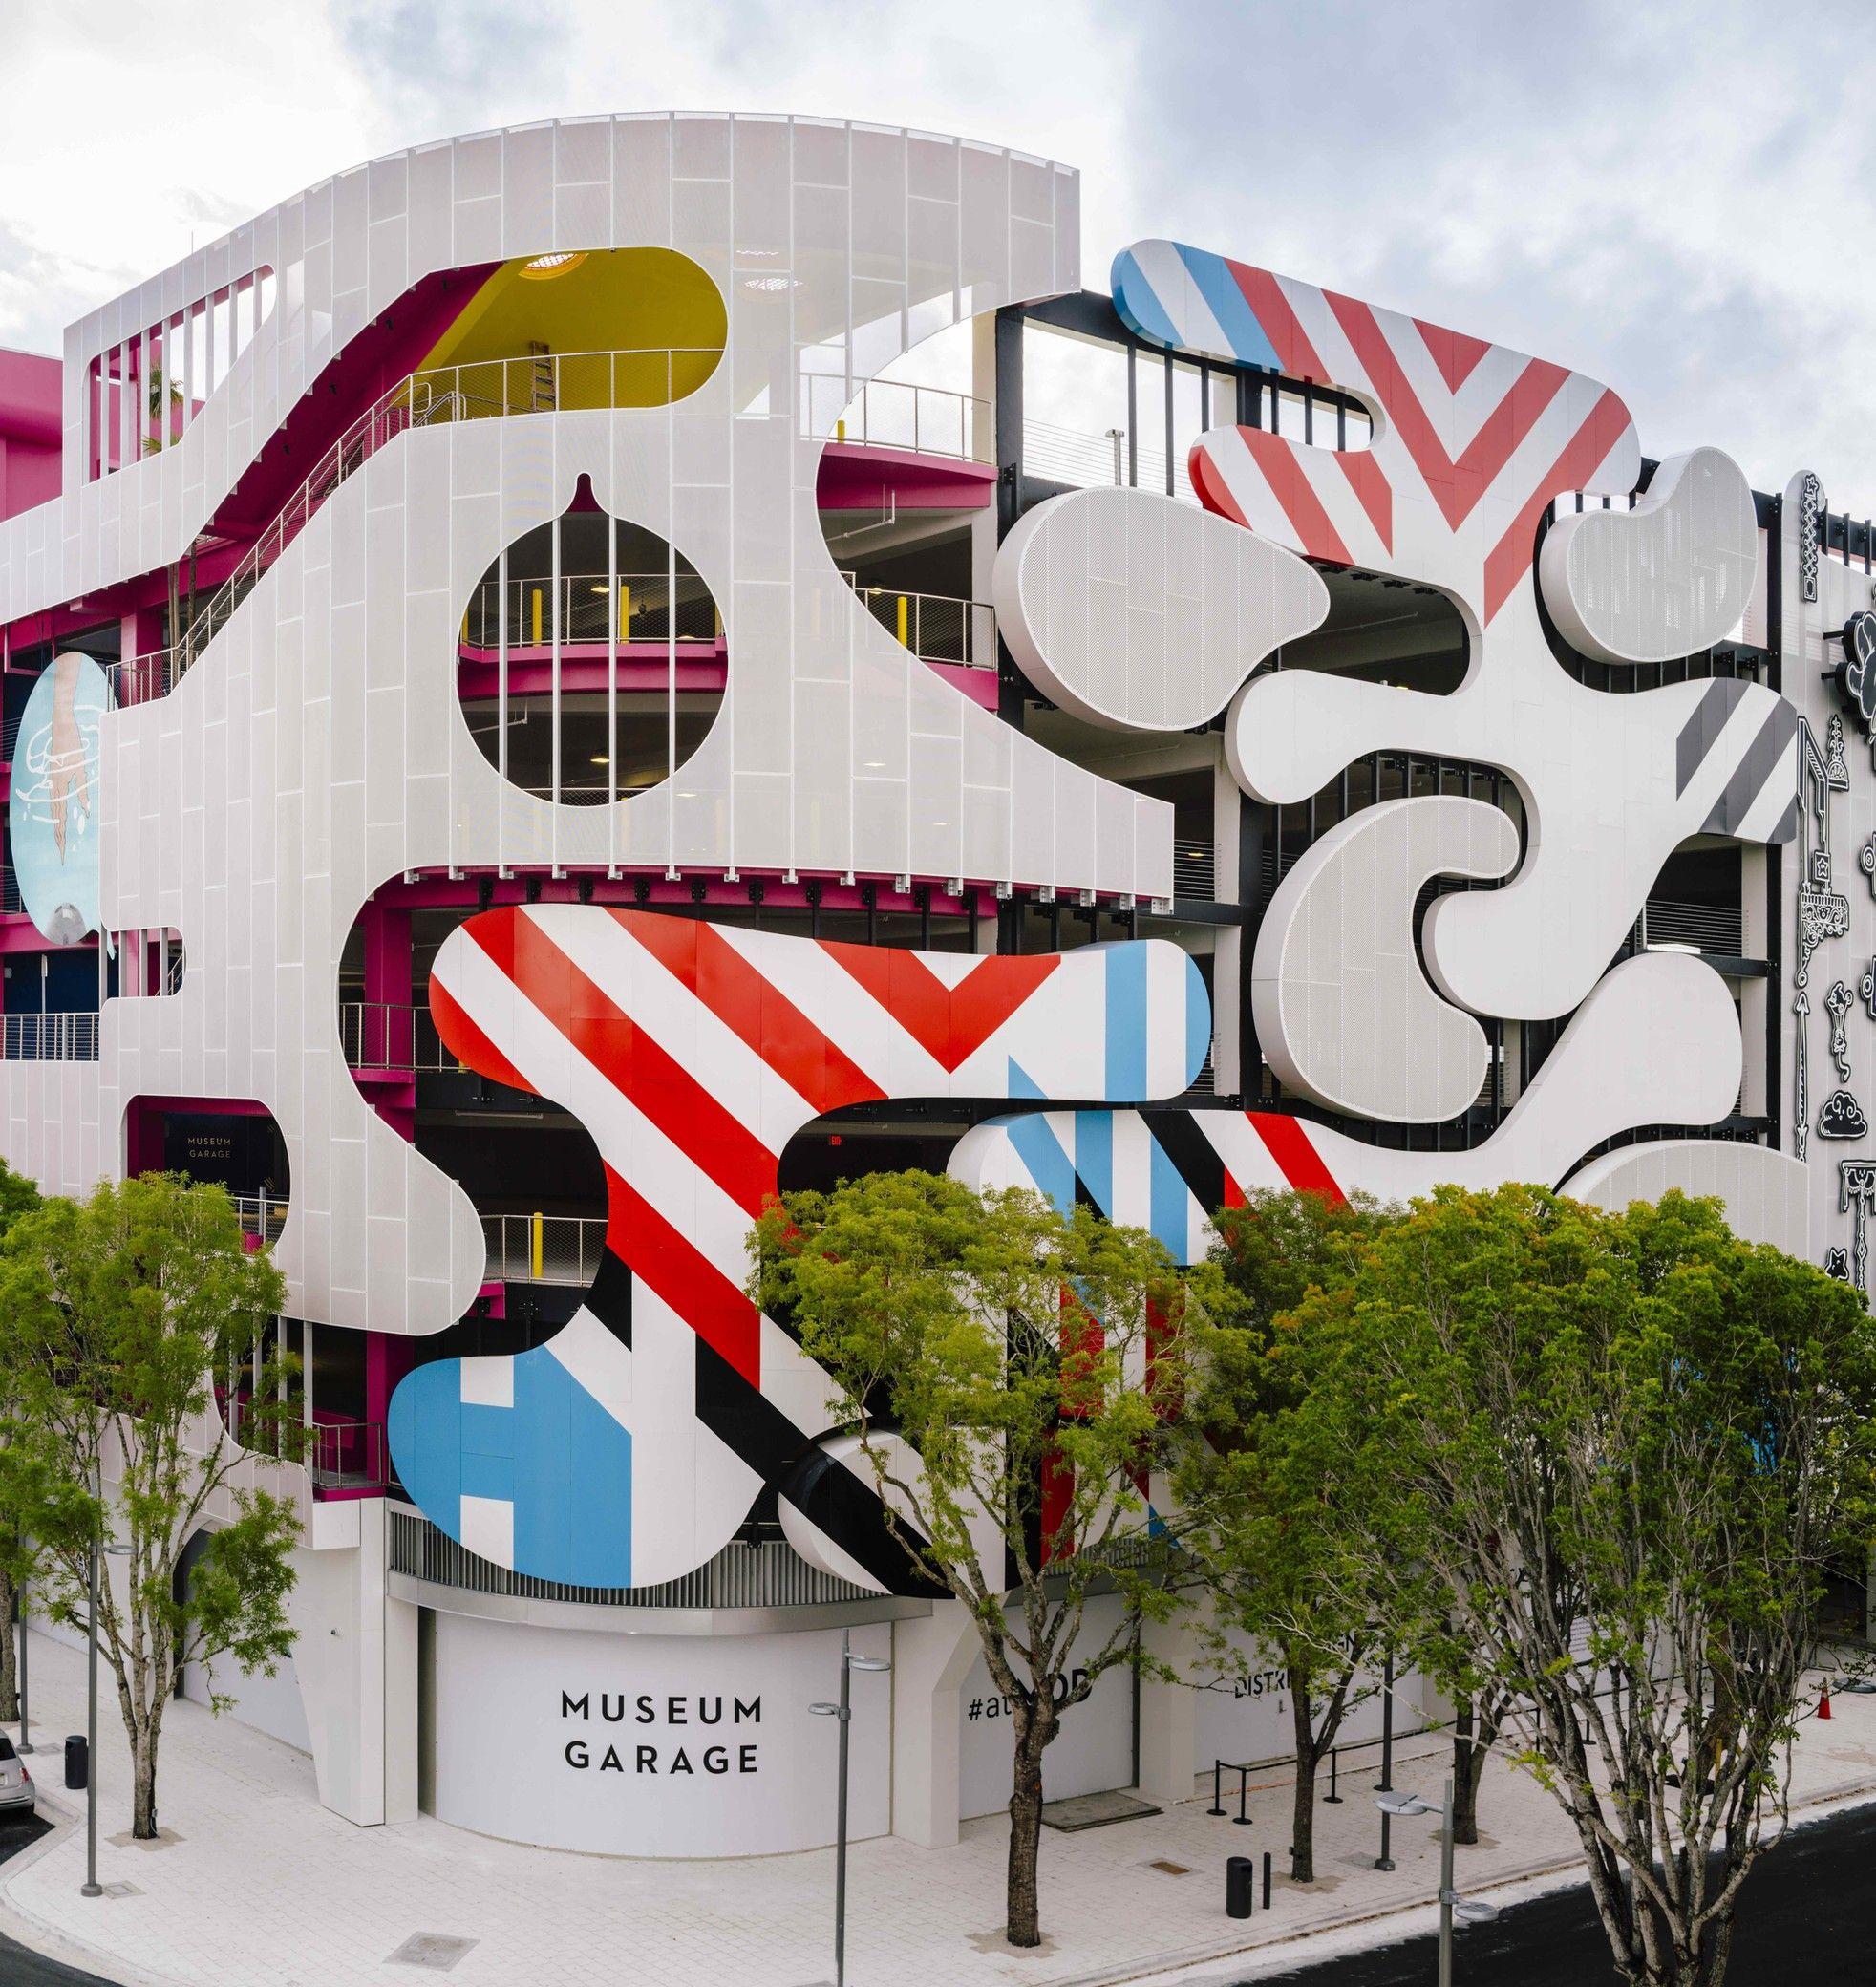 Miami Museum Garage Exterior Facade Architecture Architecture Facade Design